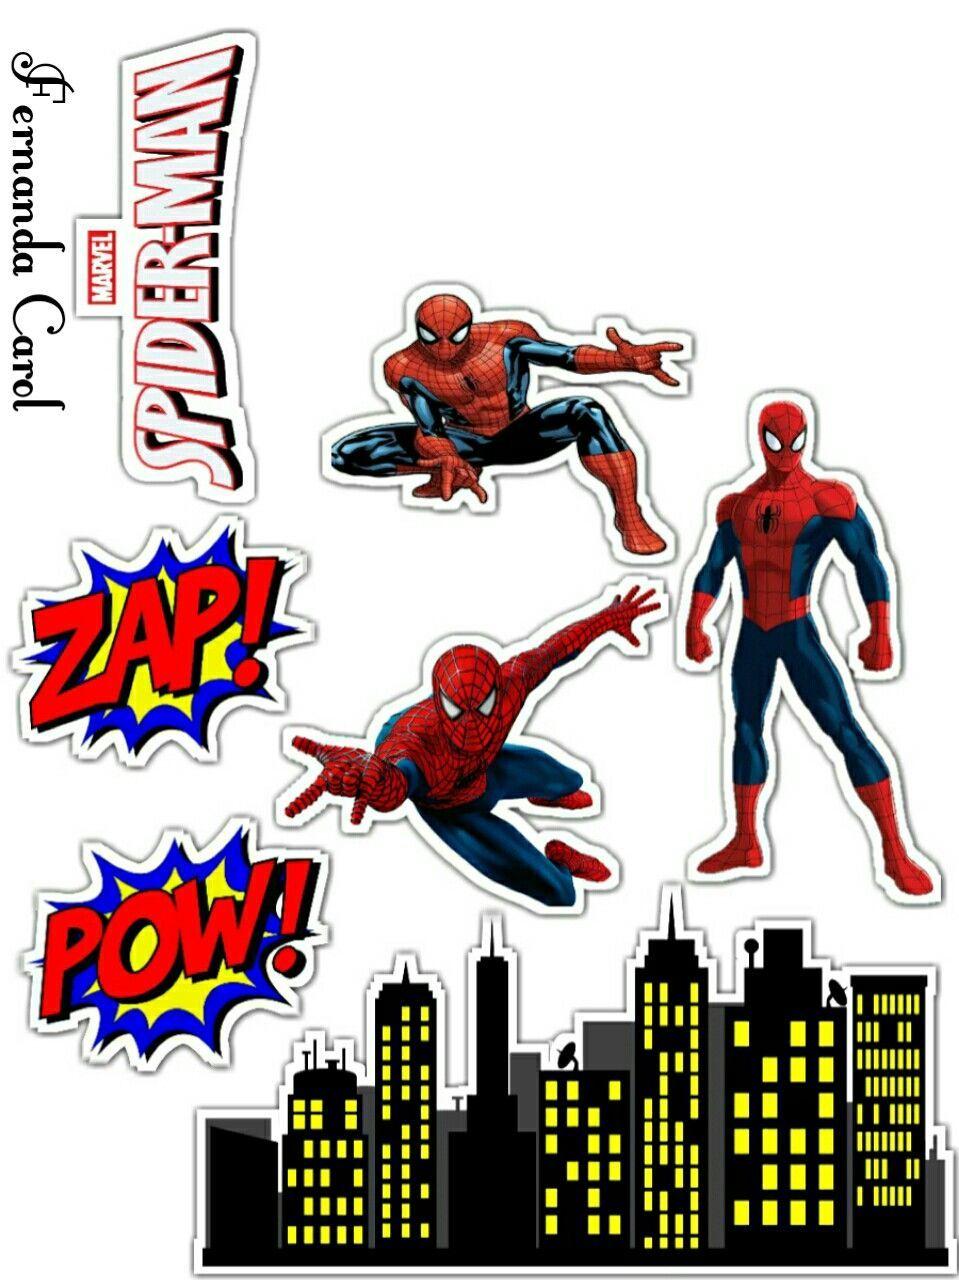 Spiderman Movie Free Printable Cake Toppers Oh My Fiesta For Geeks Spiderman Movie Spiderman Cake Spiderman